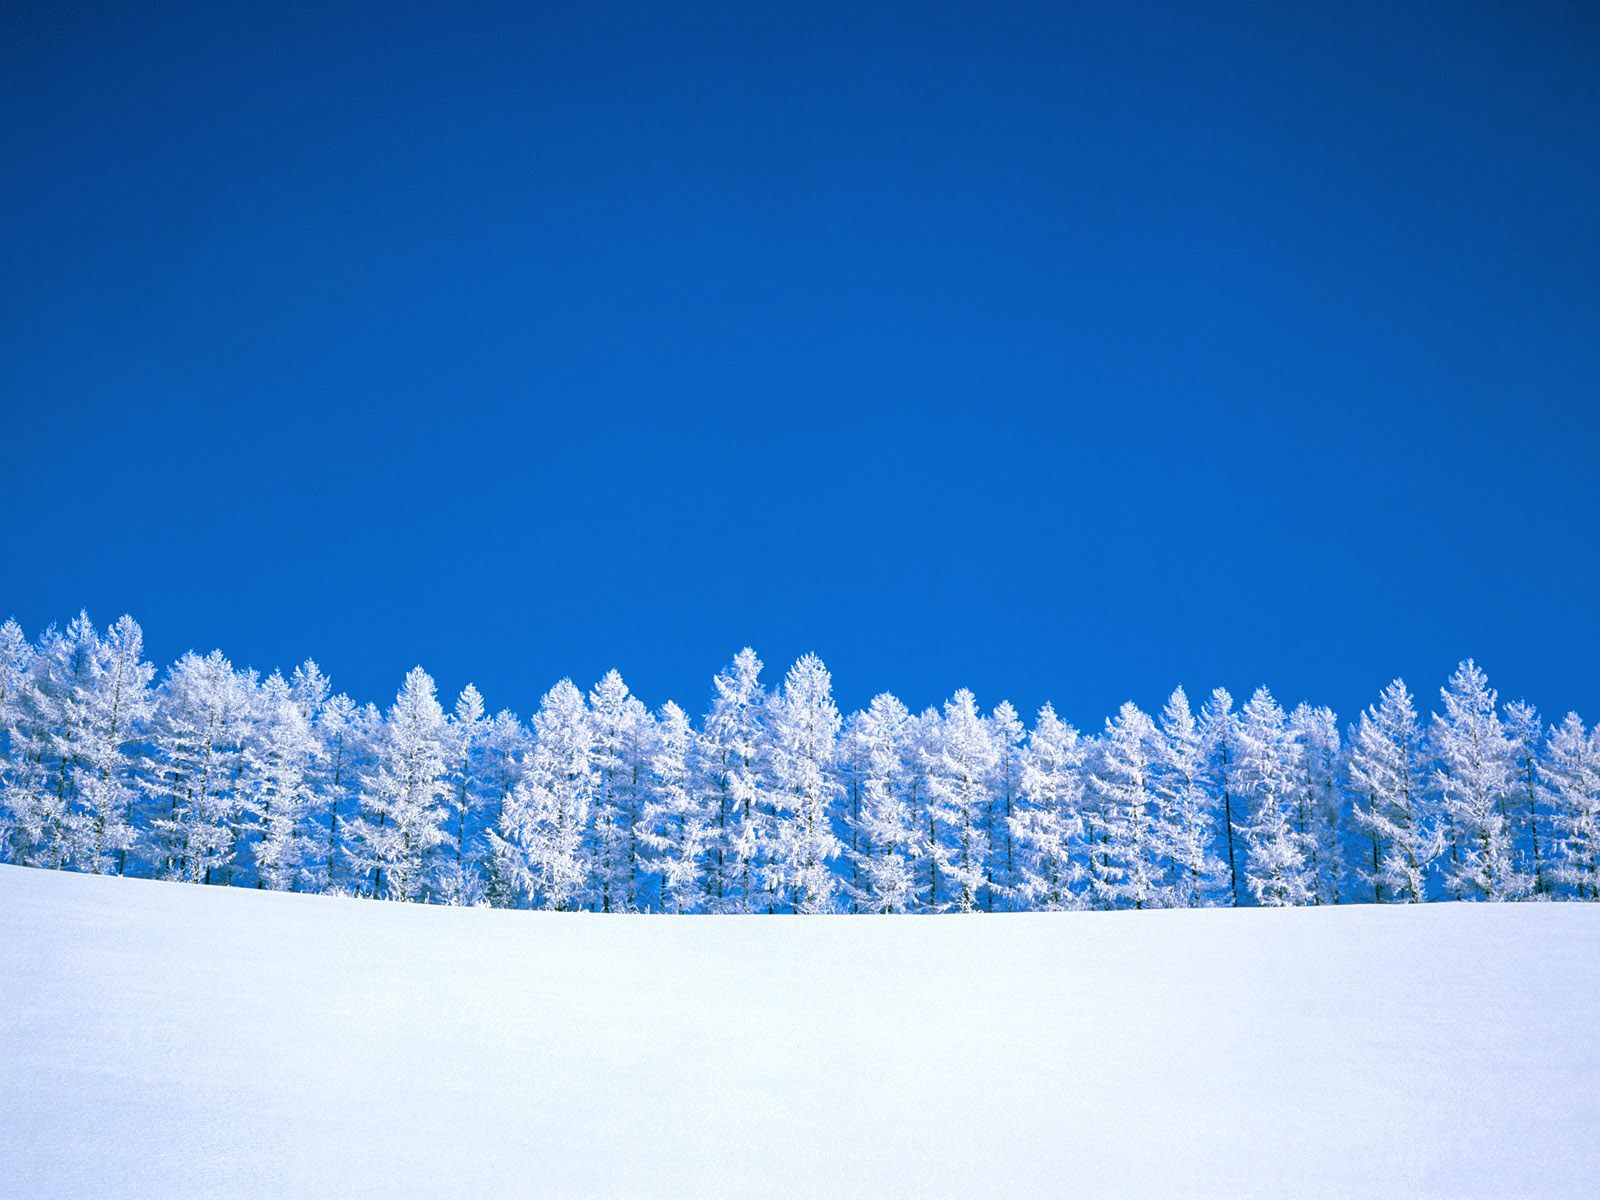 wallpaper proslut Snowy Ice Mountains Widescreen HD Wallpapers Laptop 1600x1200